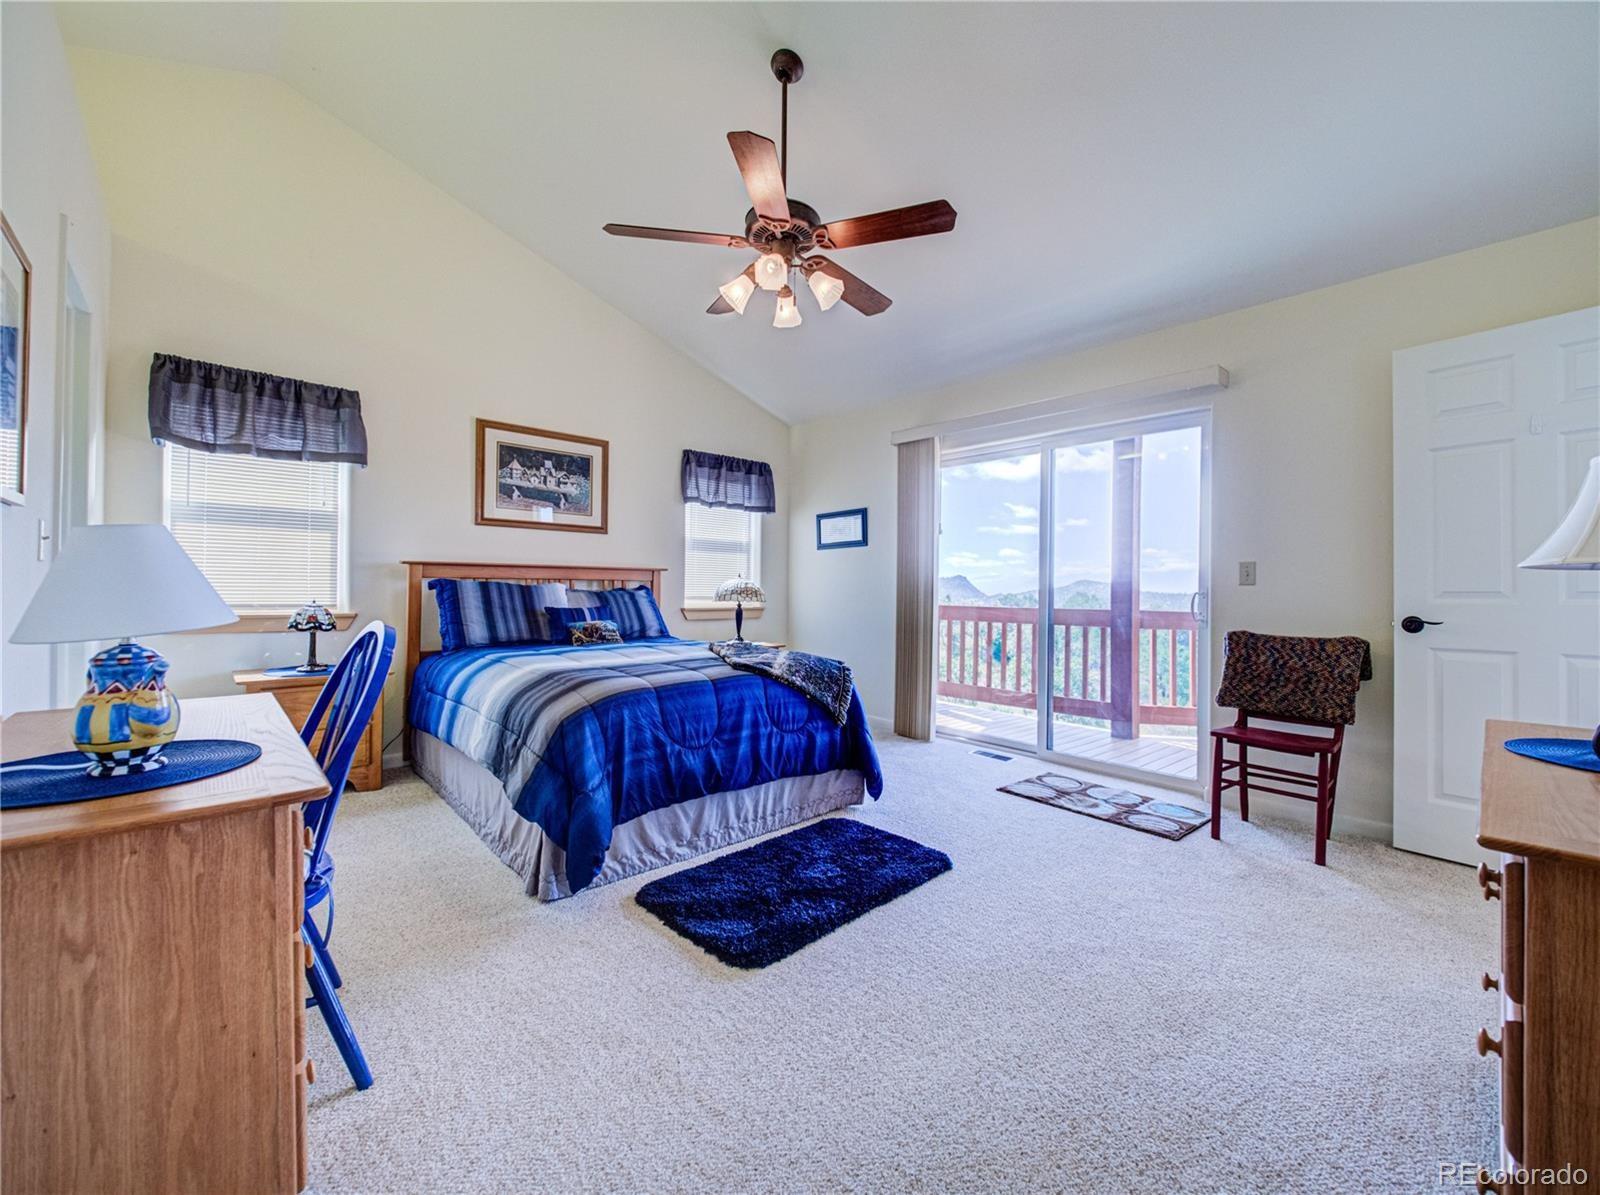 MLS# 3332968 - 26 - 296 Cedar Bluff Drive, Cotopaxi, CO 81223